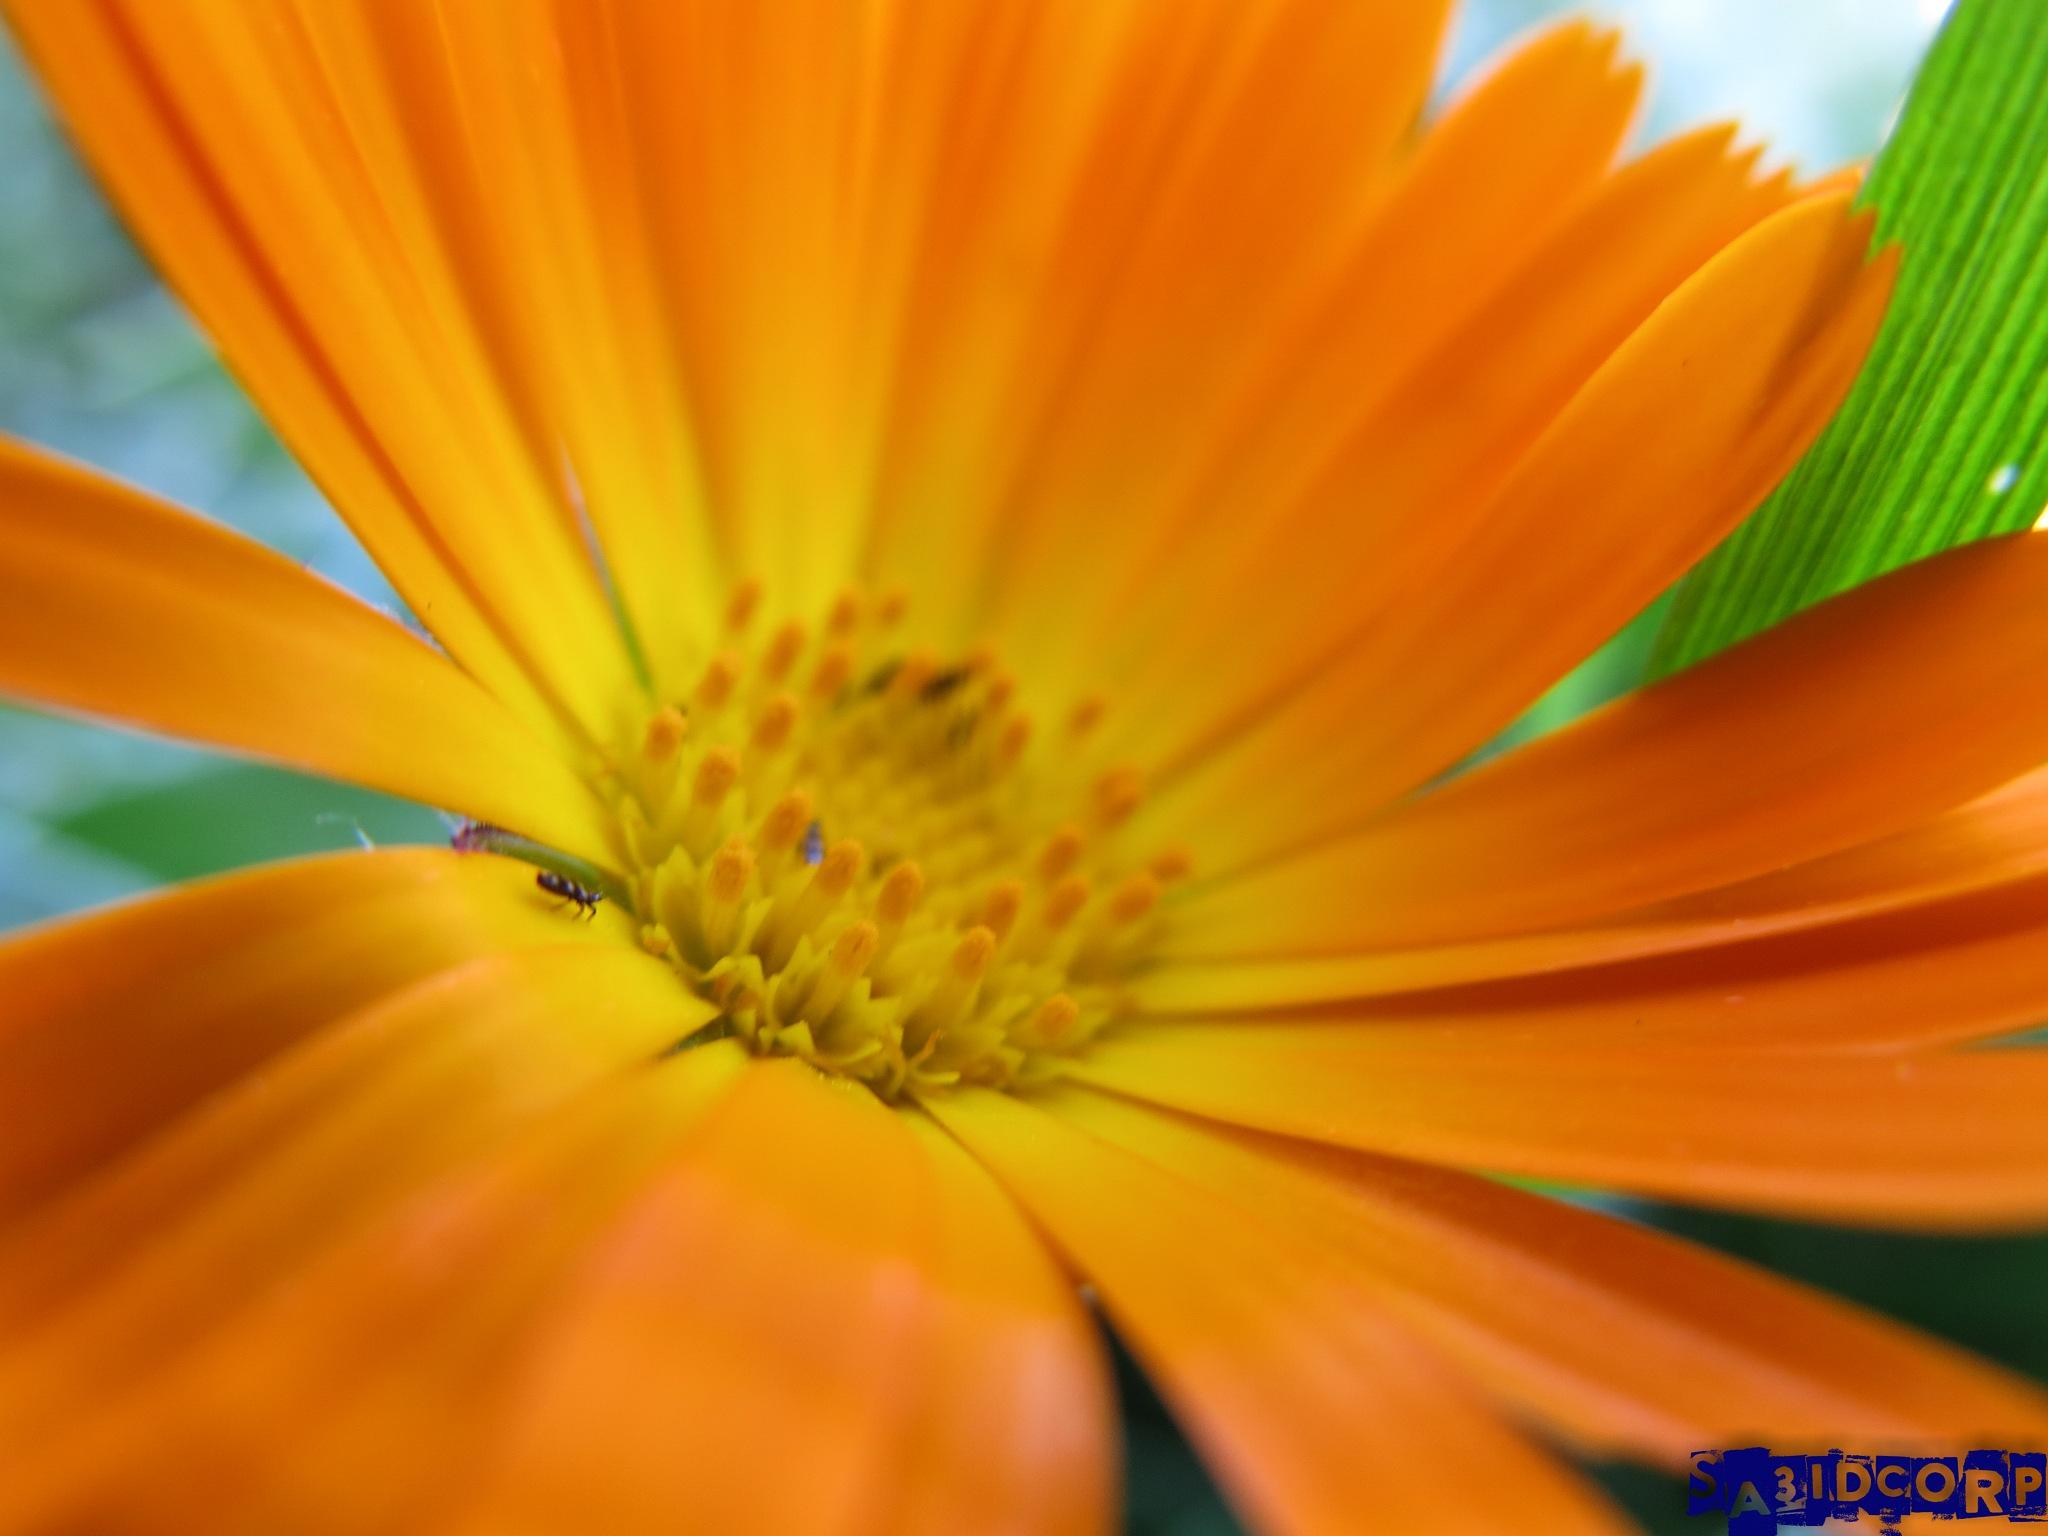 flower shape  by sa3idcorp